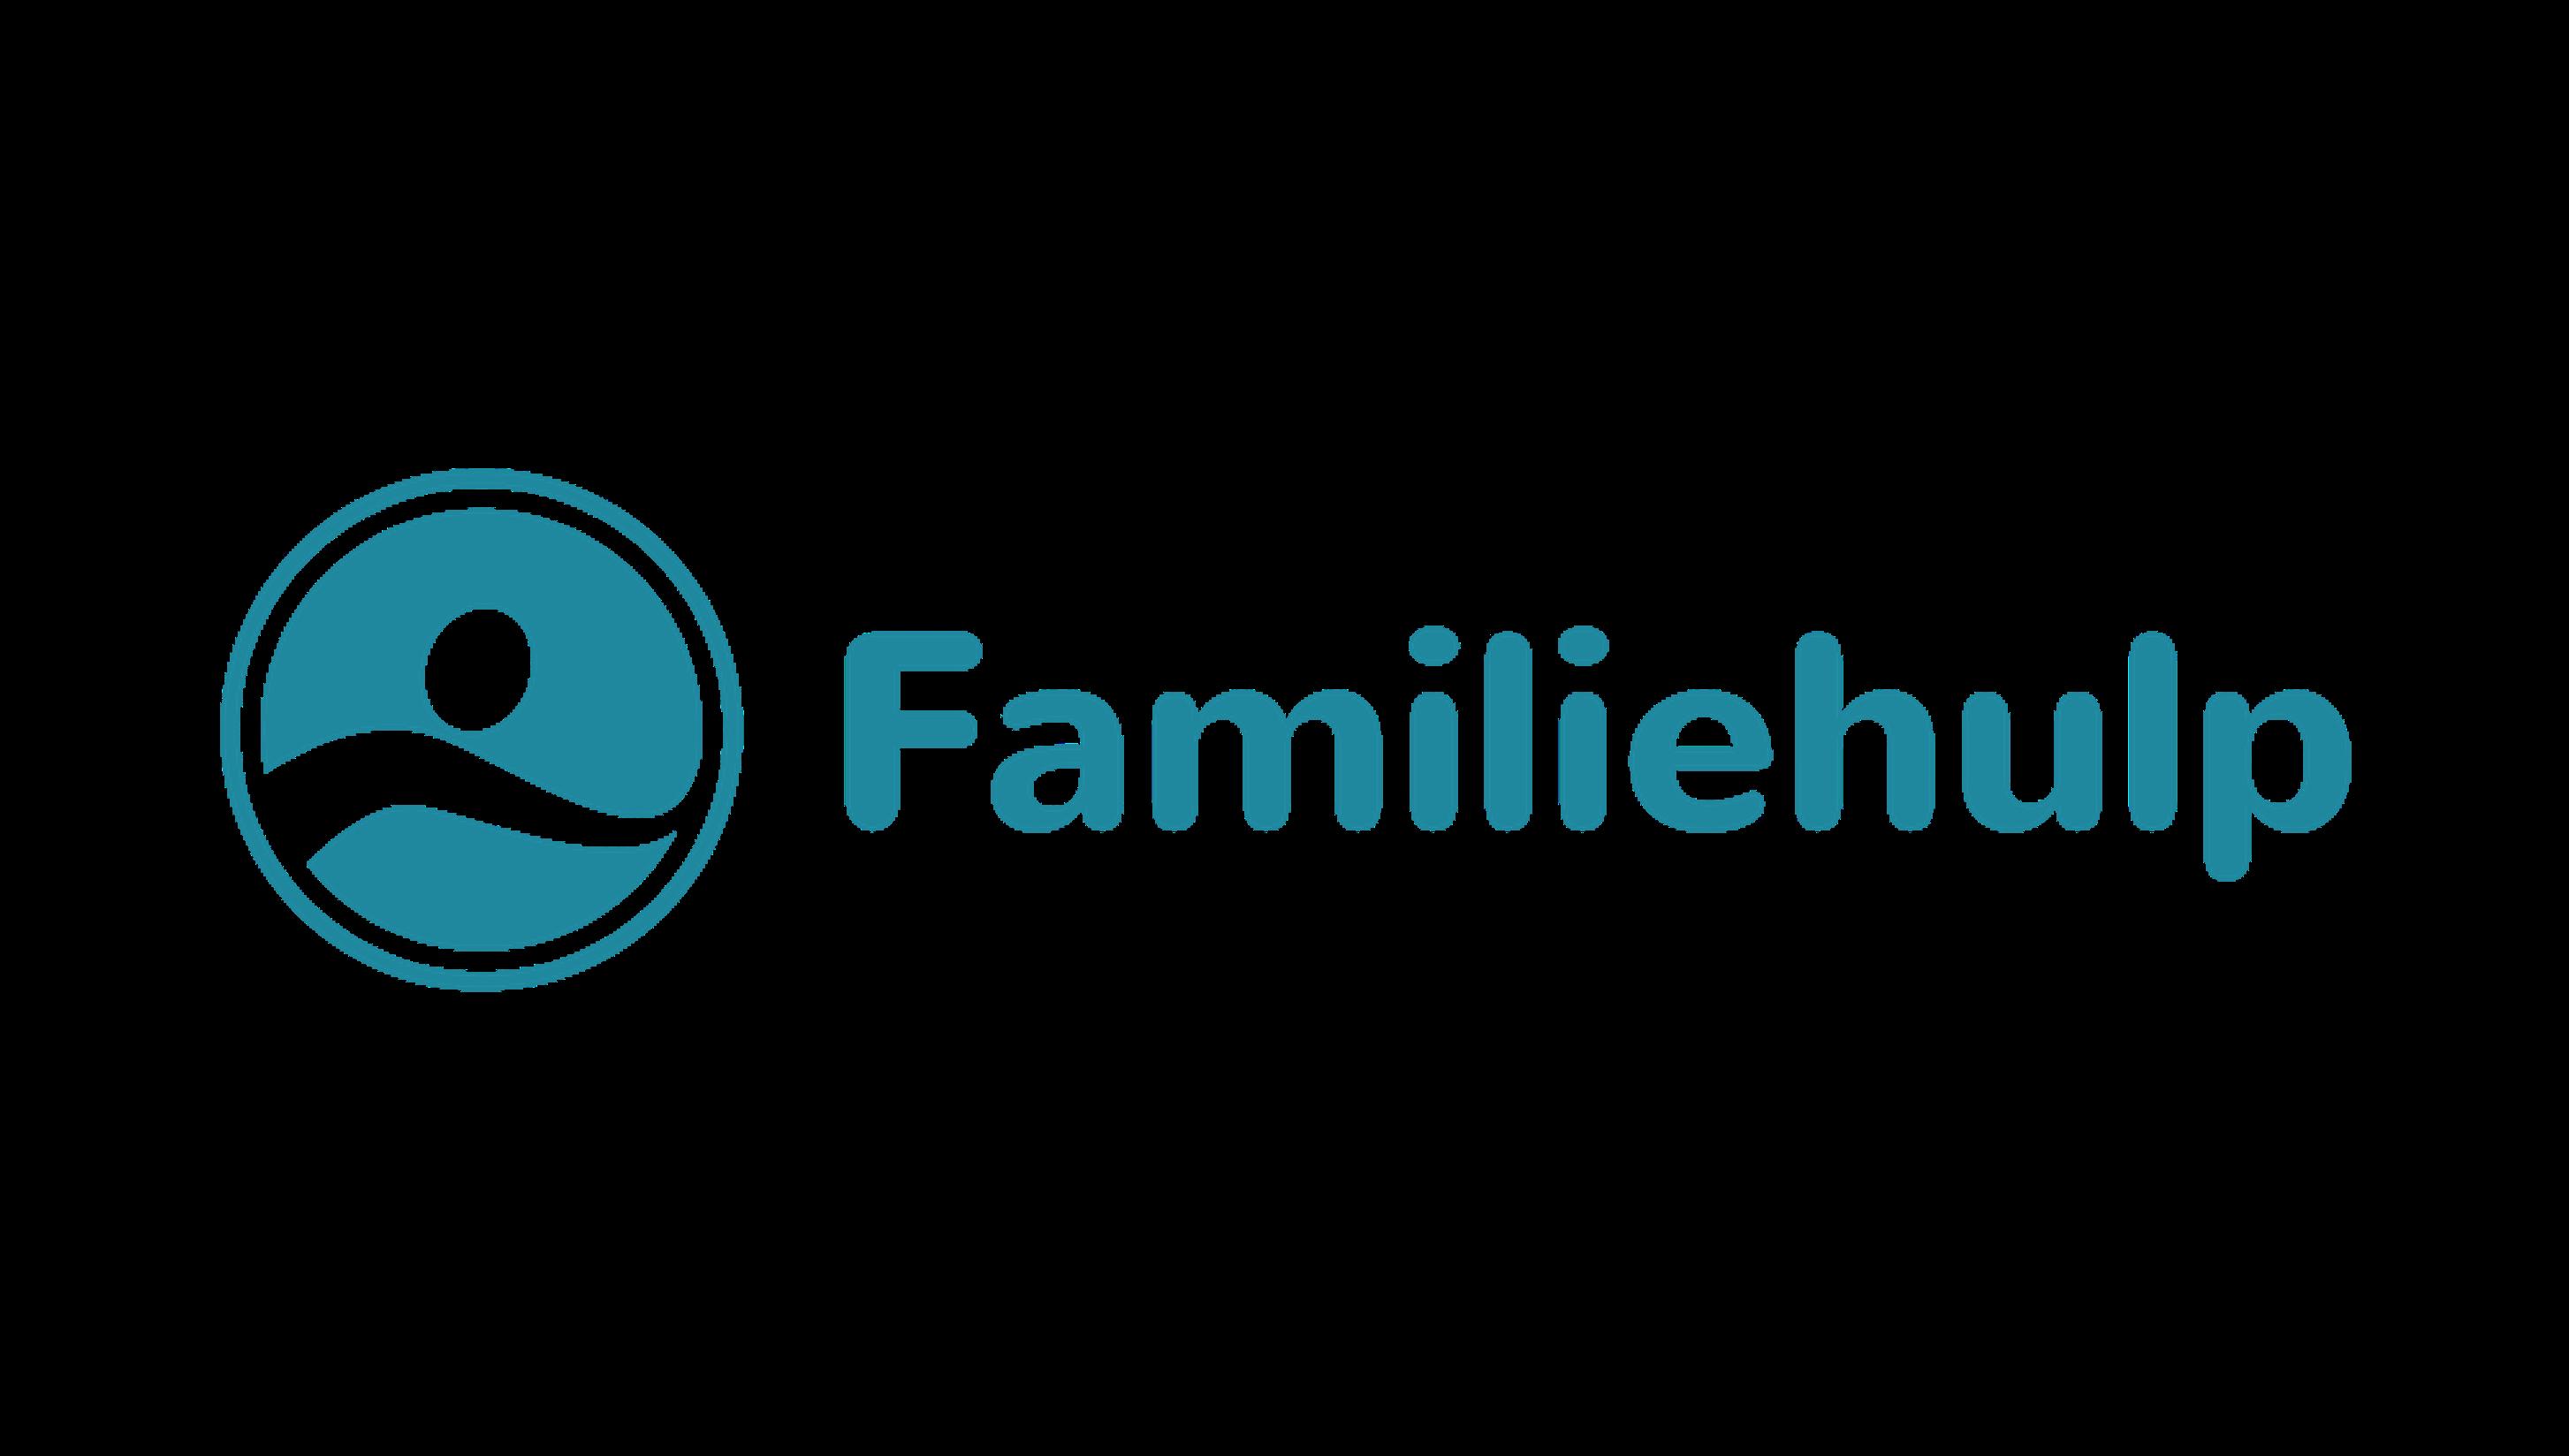 Familiehulp logo